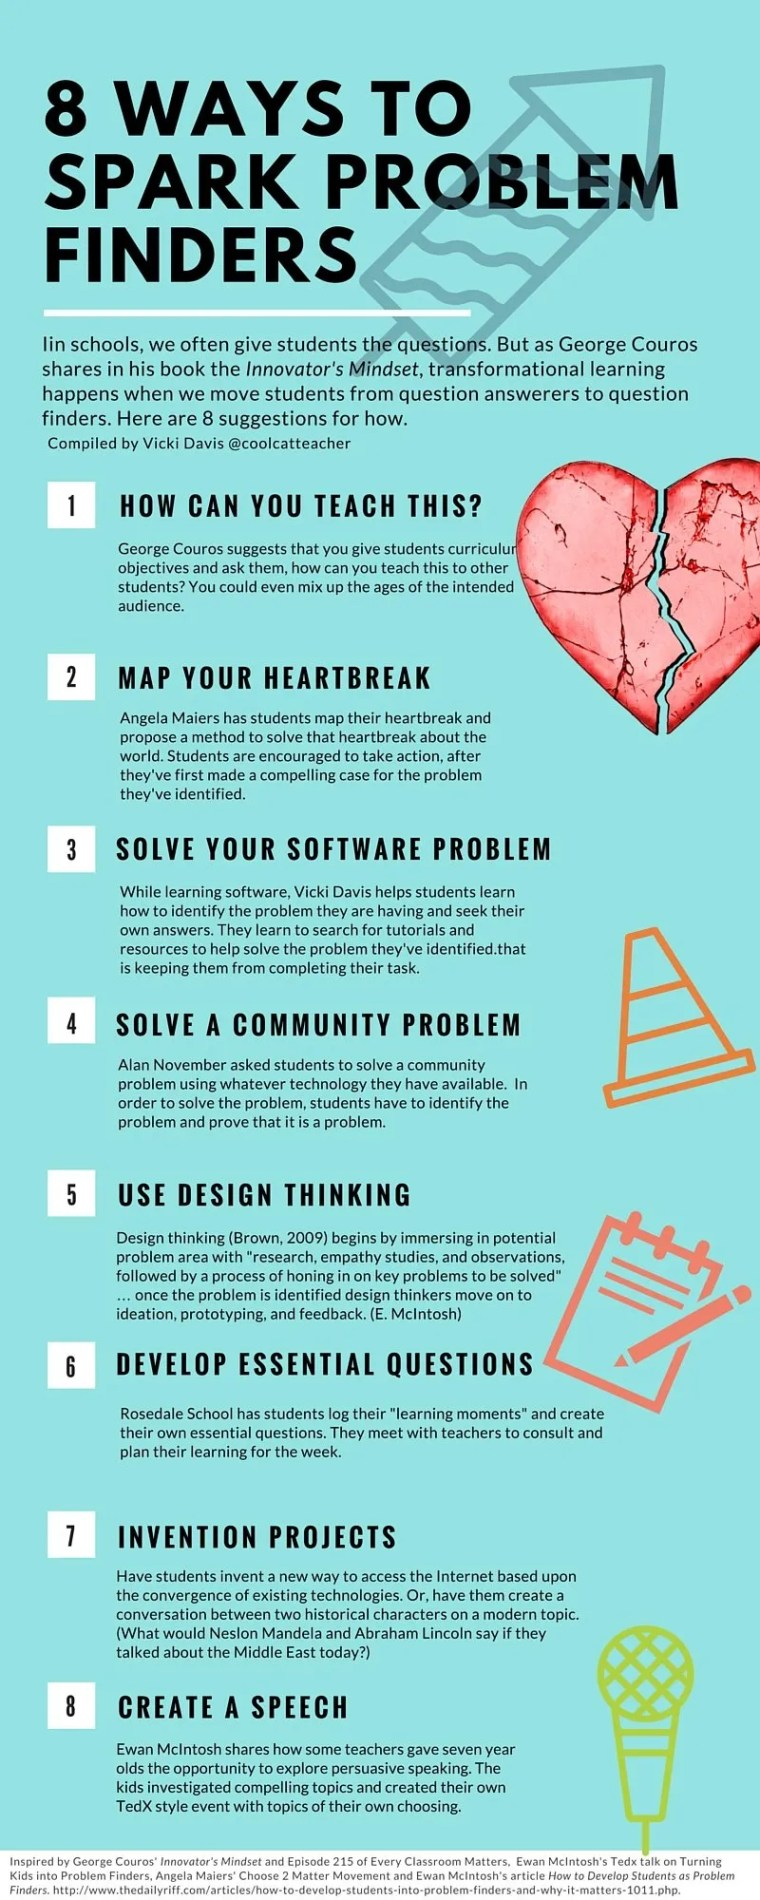 8 ways to spark problem finders